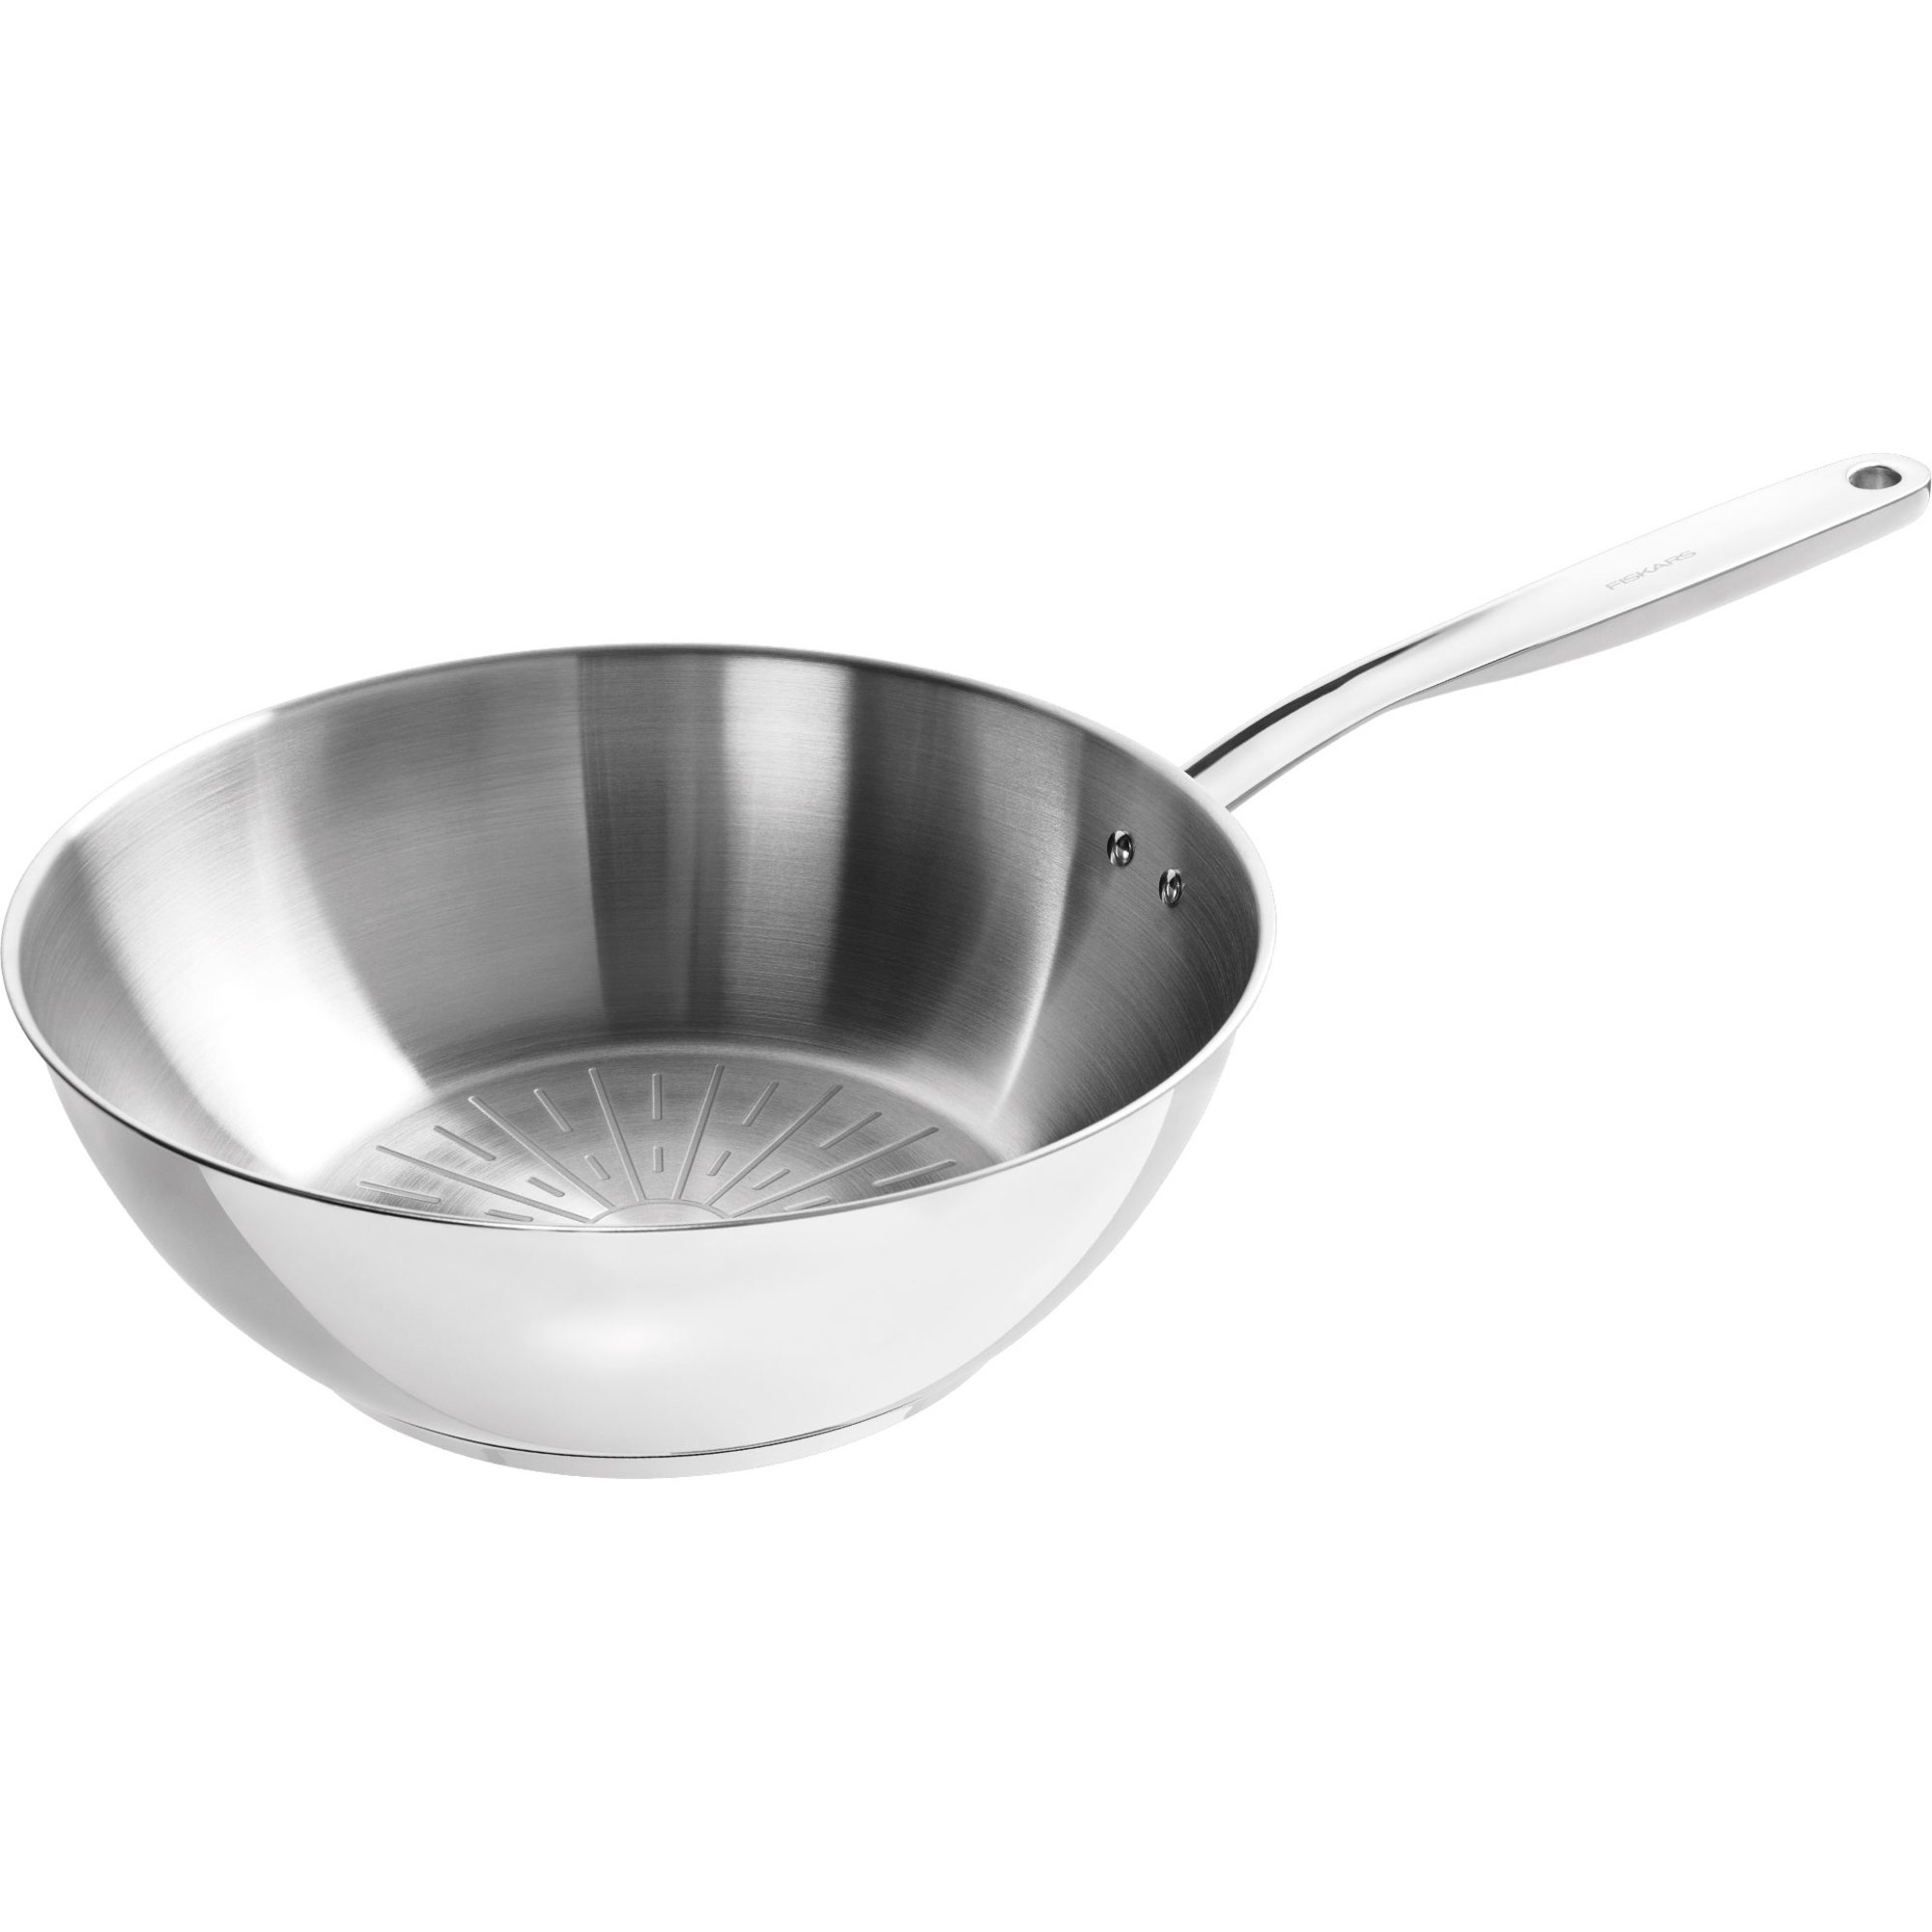 Fiskars All Steel Pure wokpanna 28 cm.